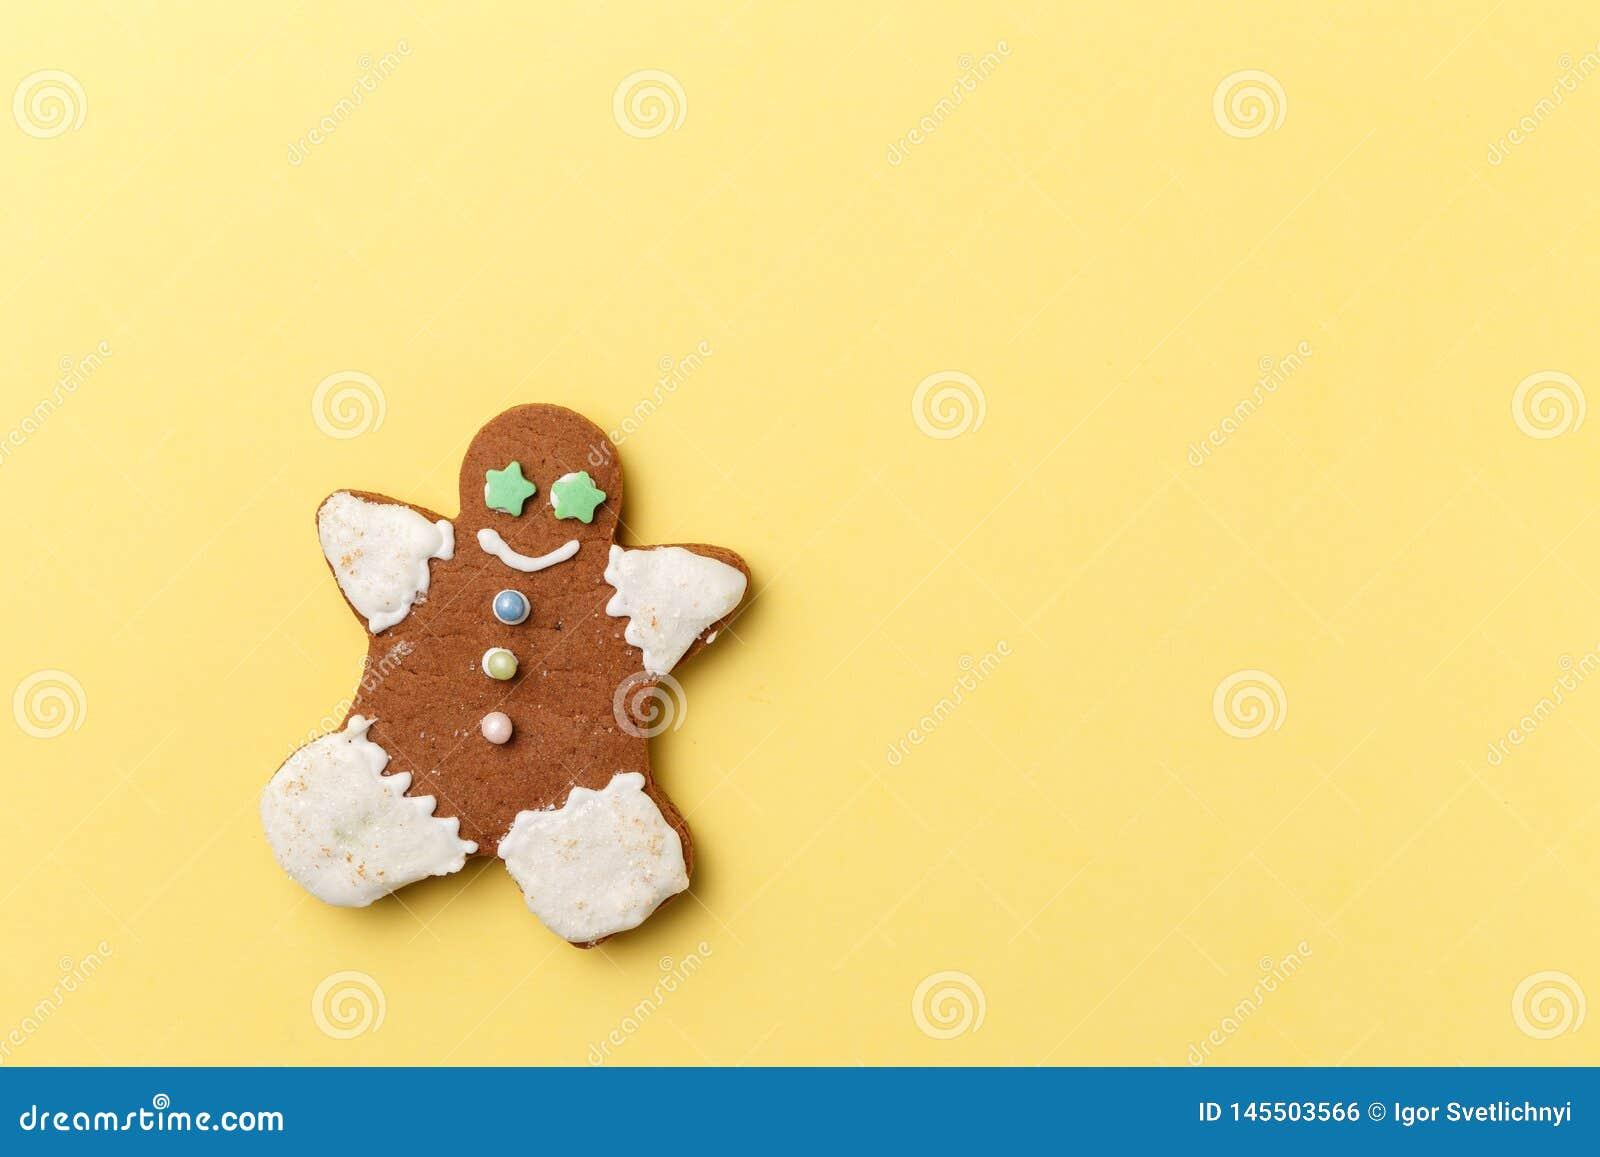 Christmas cookies on yellow background